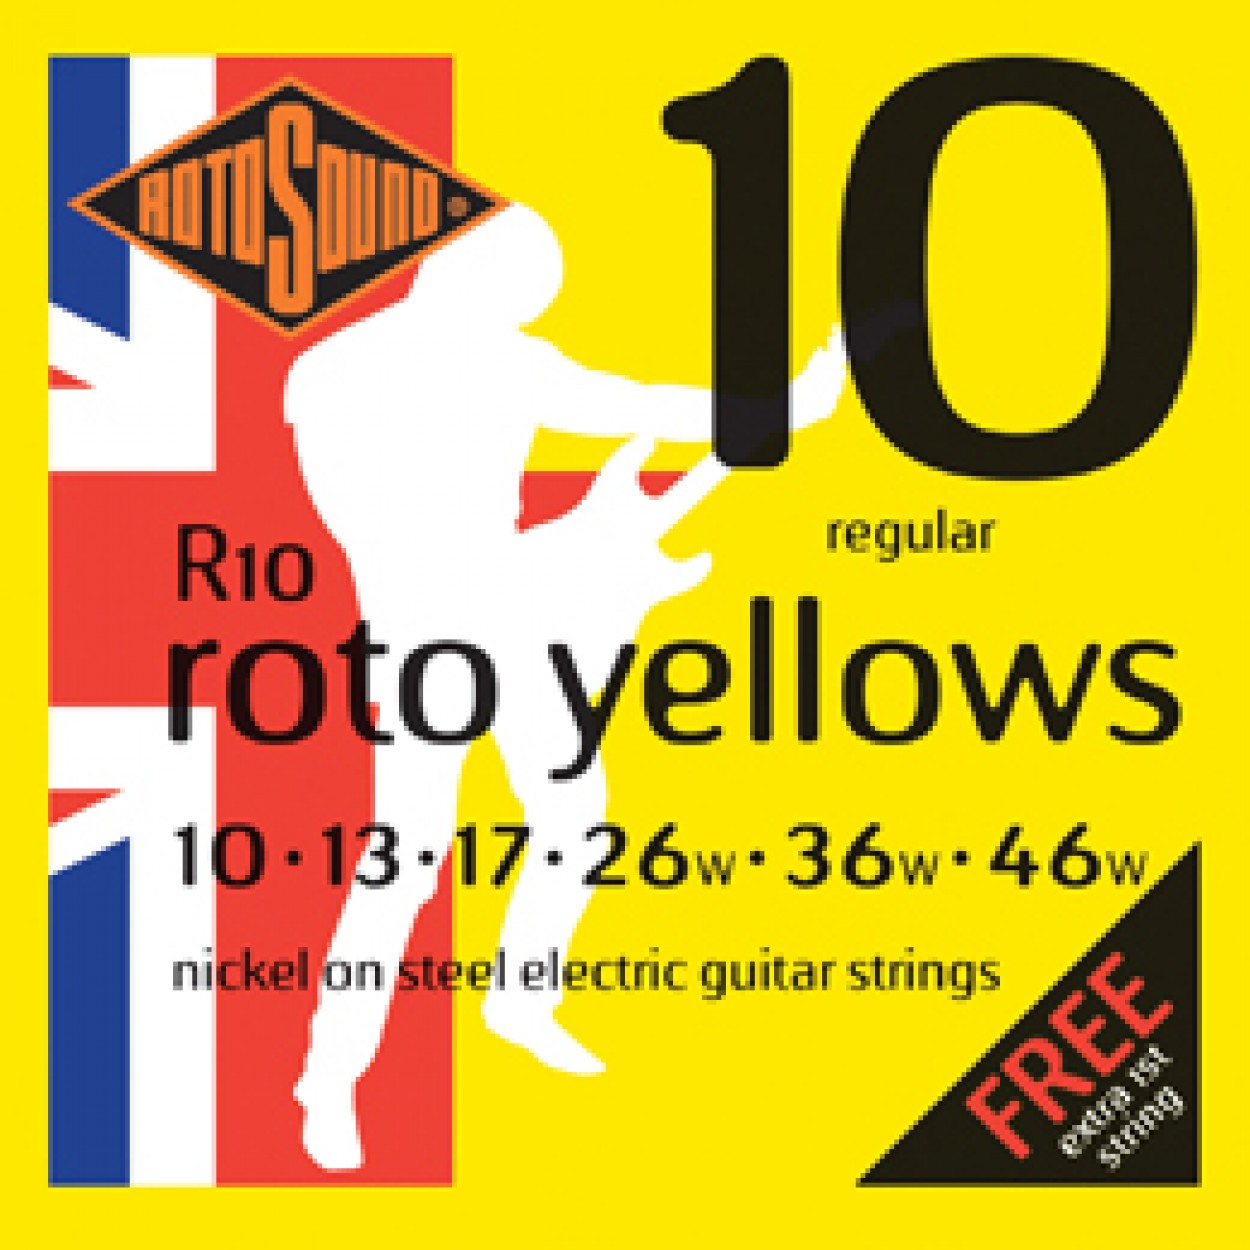 Rotosound Guitar Strings Yellows 10-46